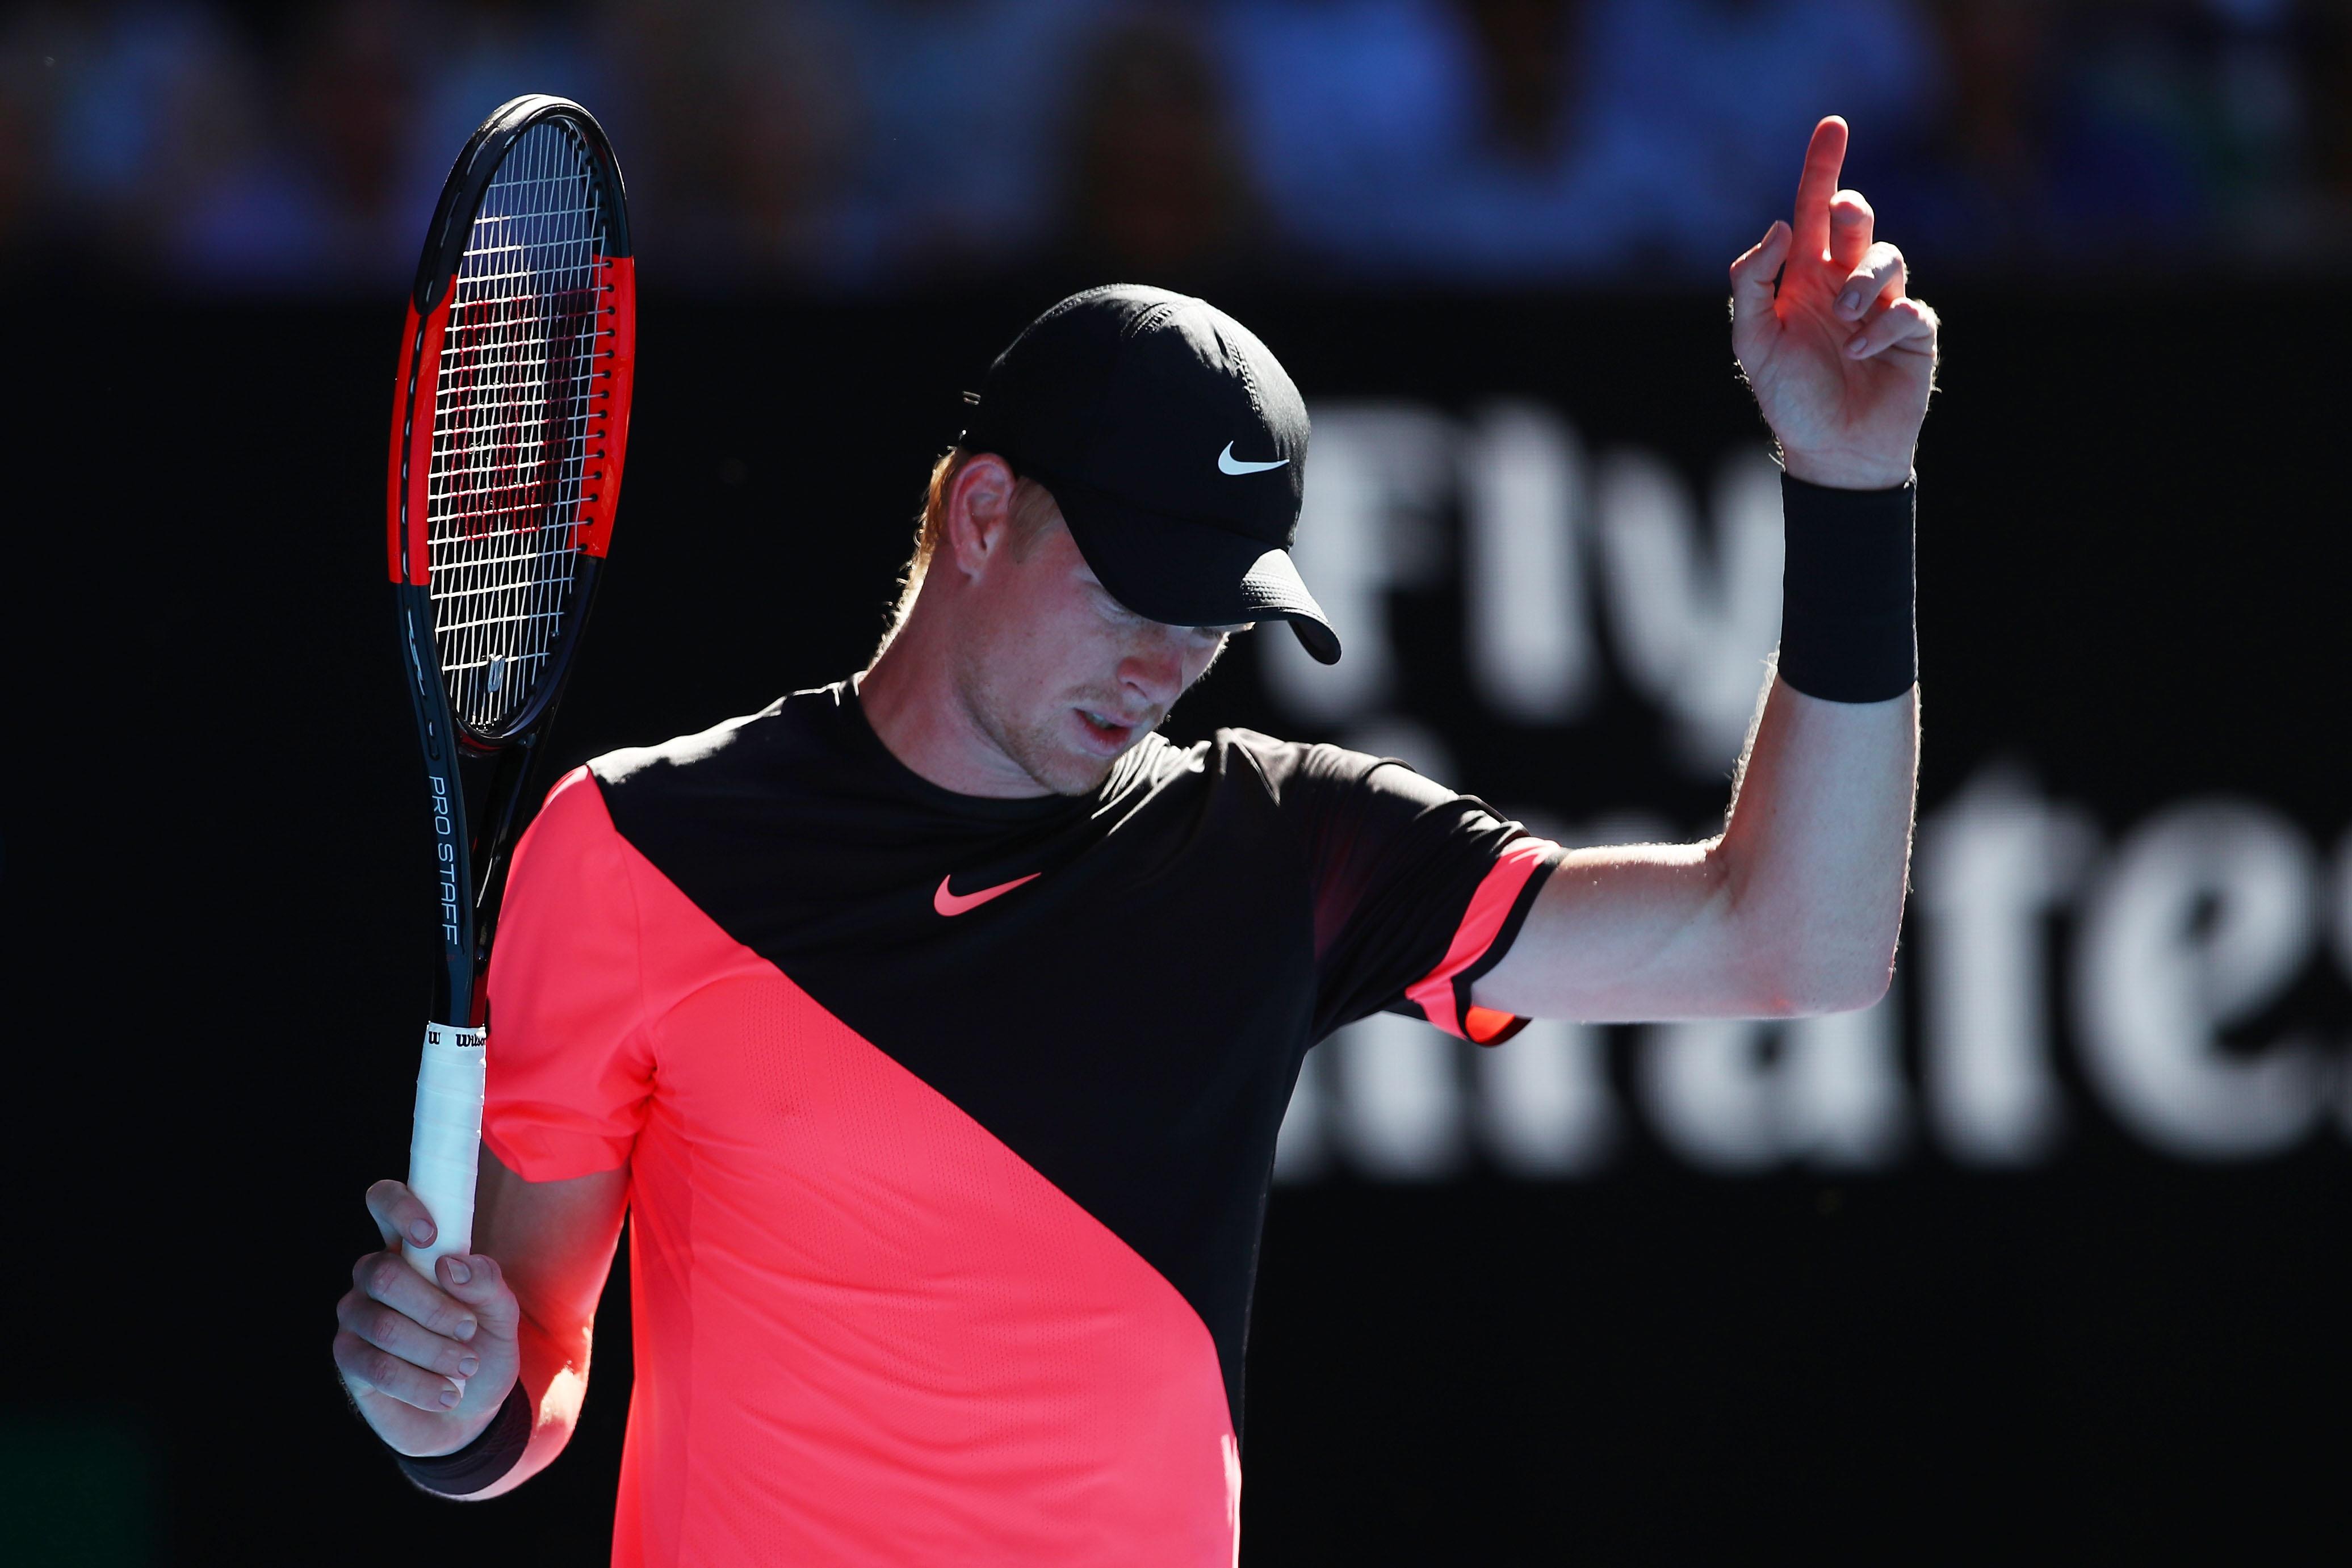 Kyle Edmund in the quarter-final, Australian Open 2018